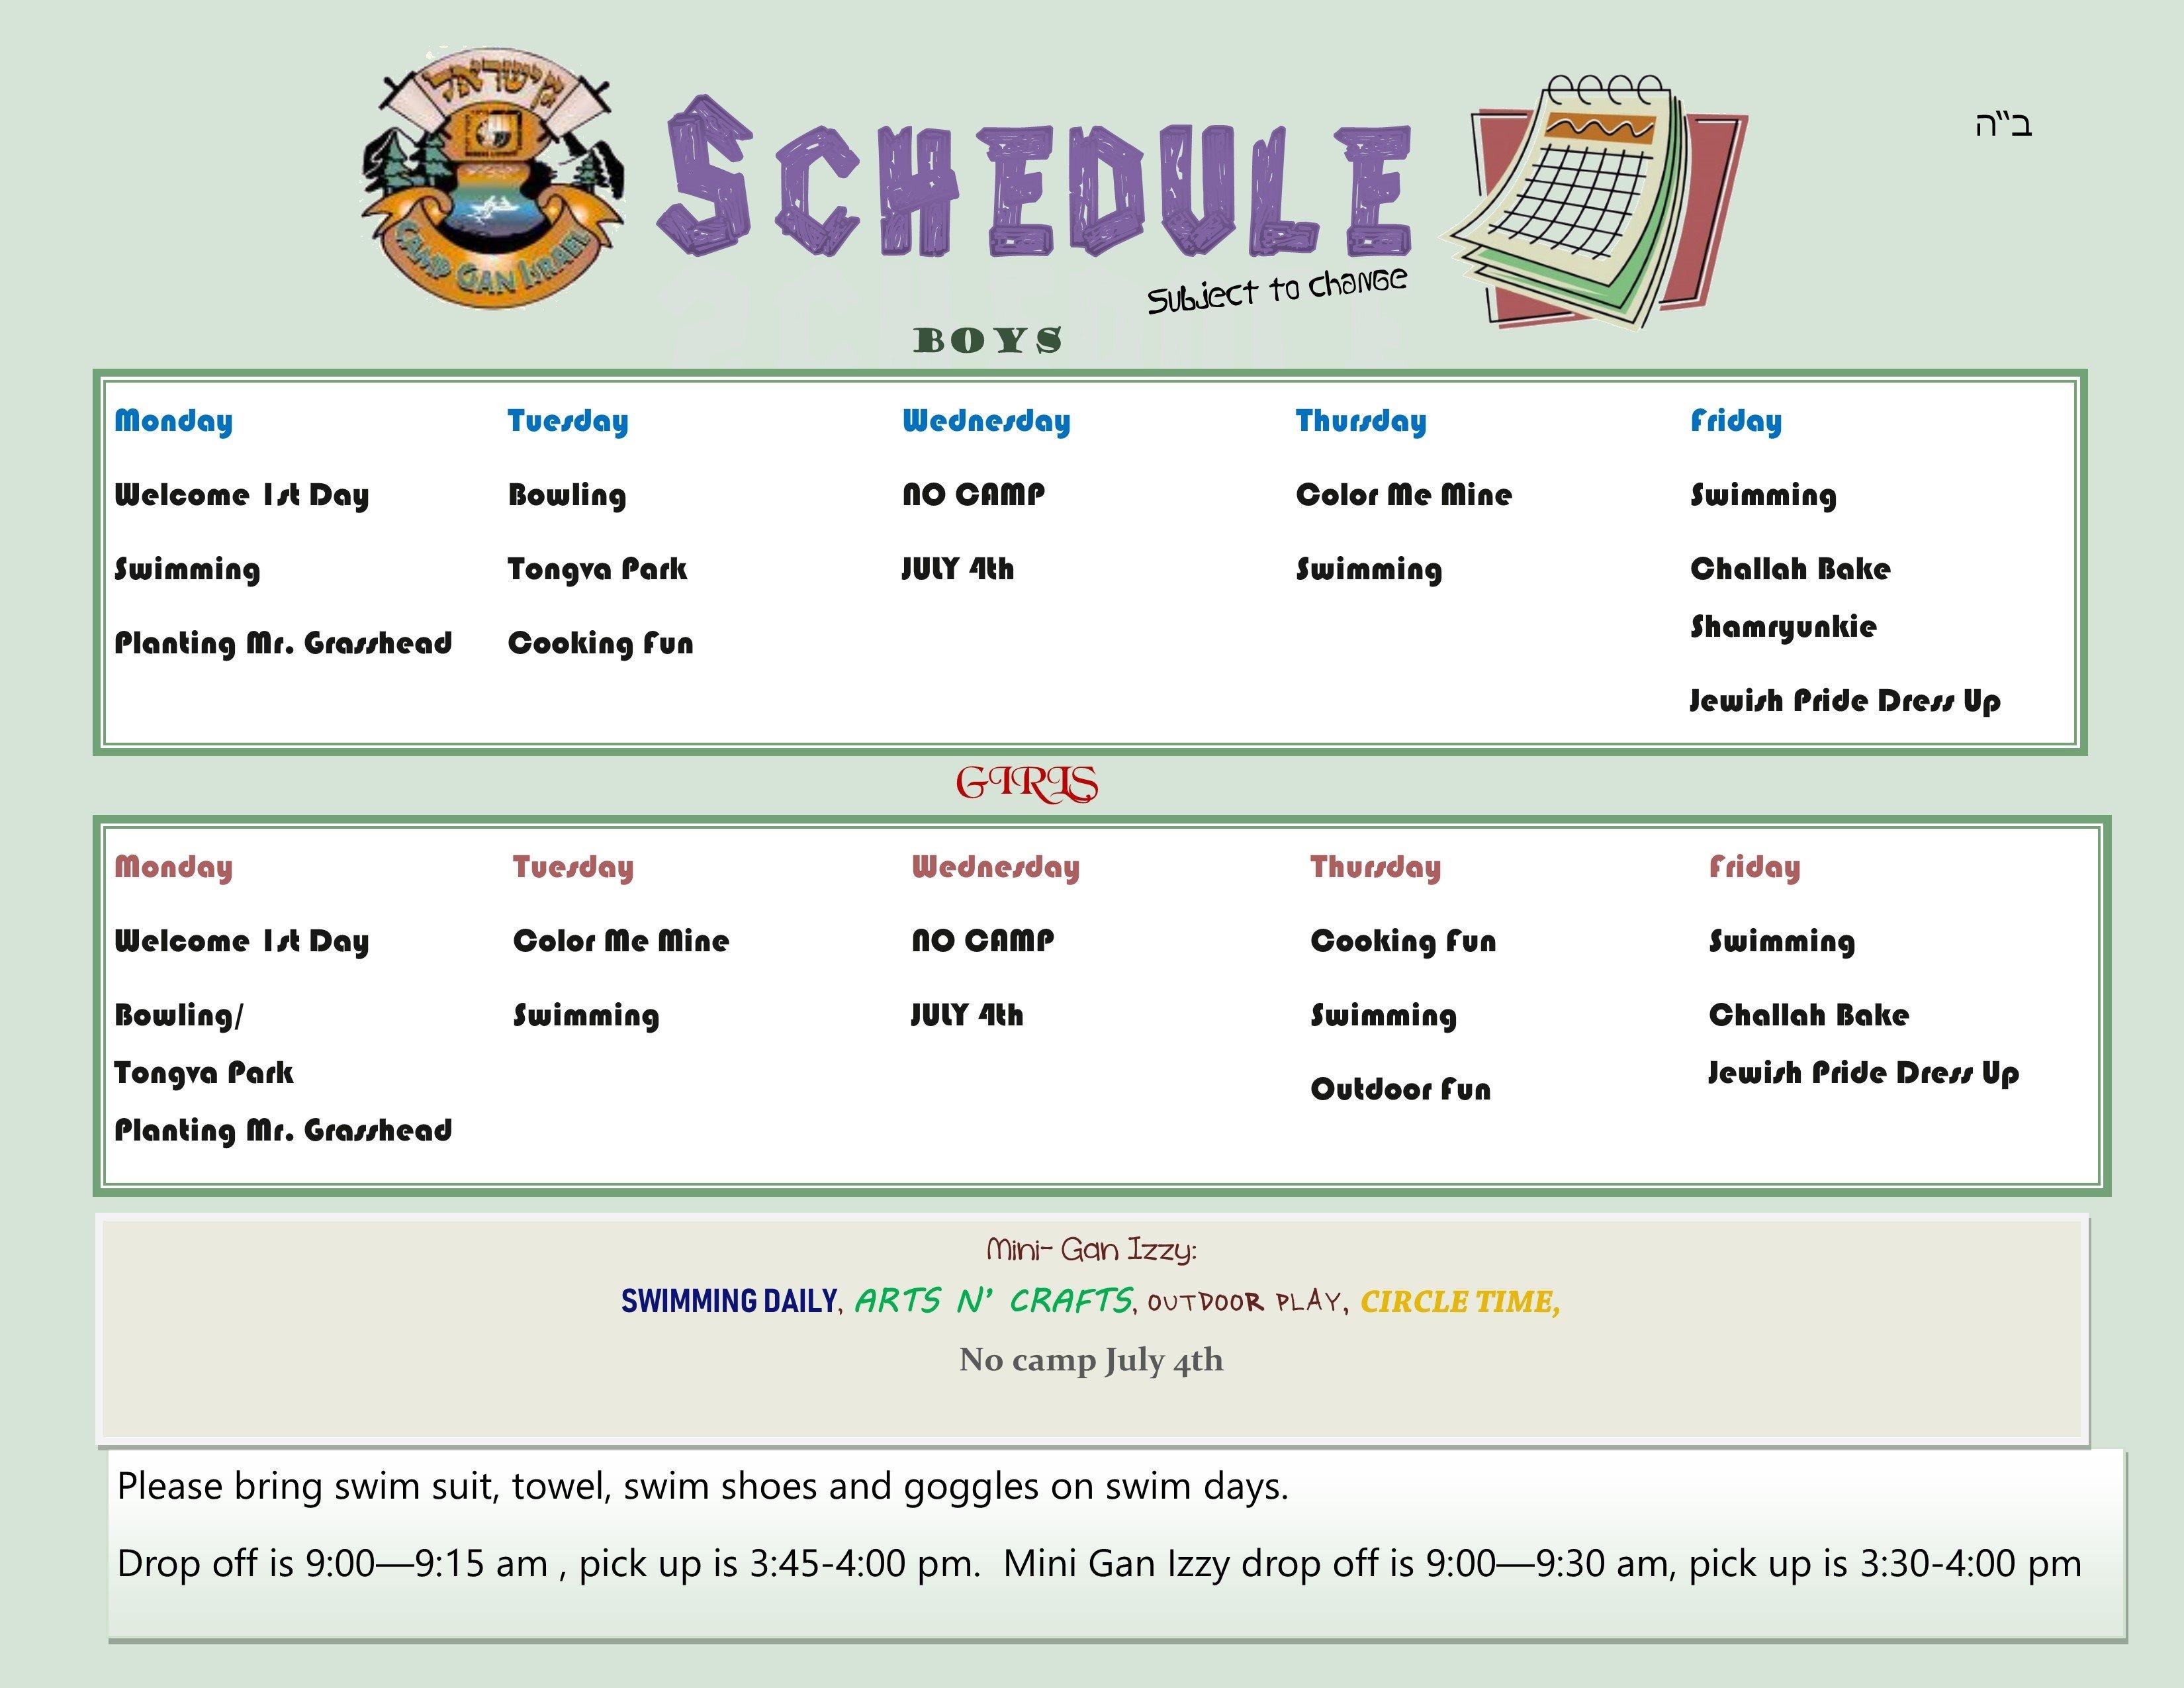 1st week schedule 2018.jpg